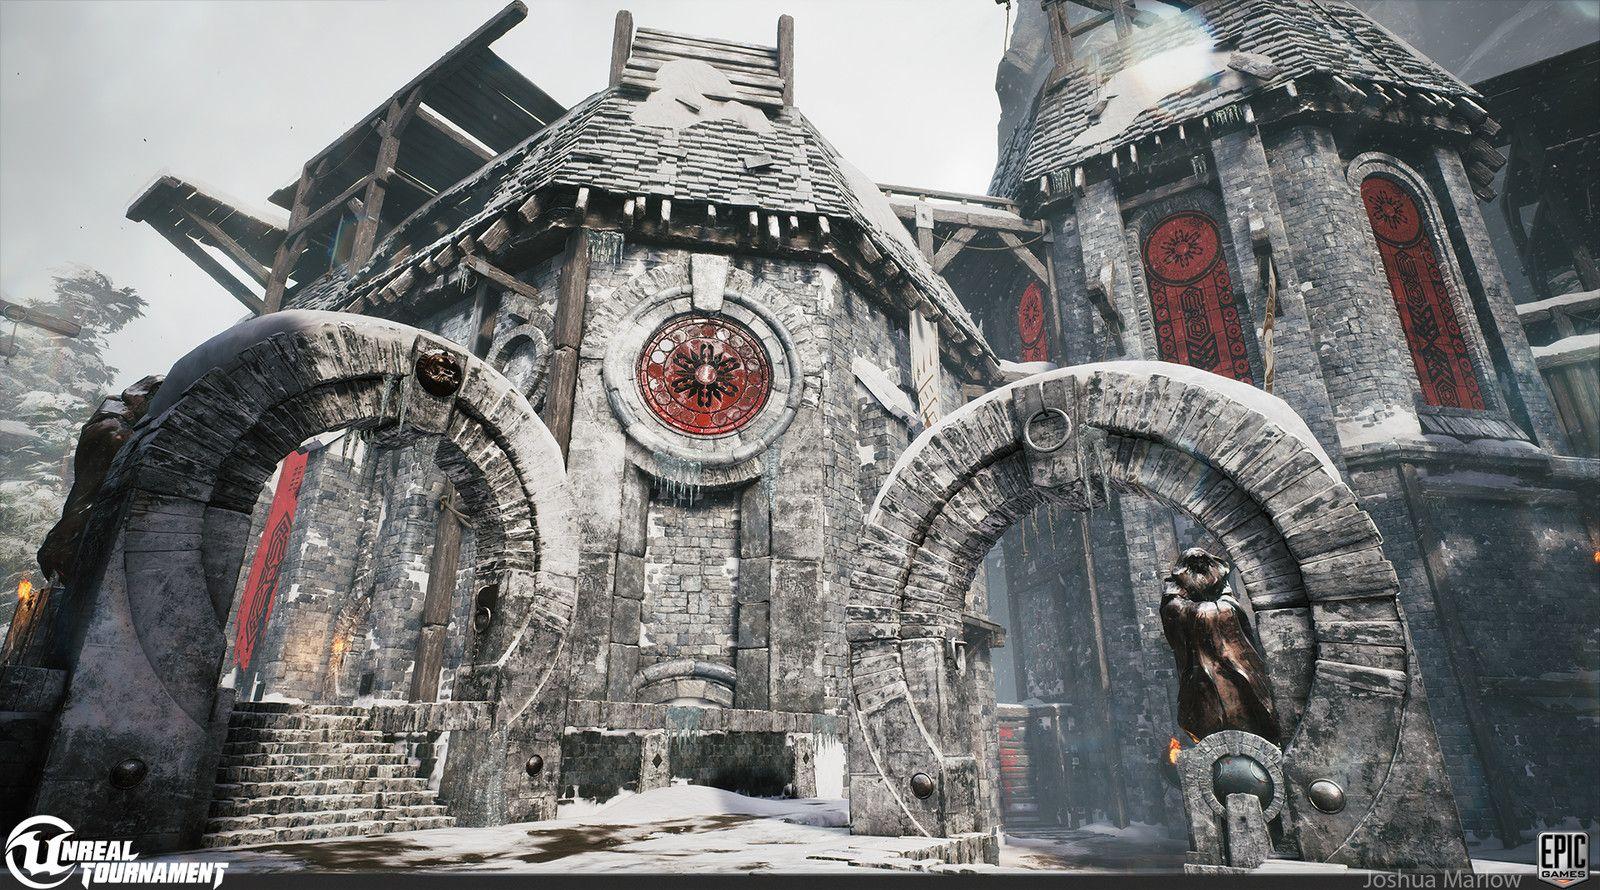 Unreal Tournament DM-Chill , Josh Marlow on ArtStation at https://www.artstation.com/artwork/ENrAn